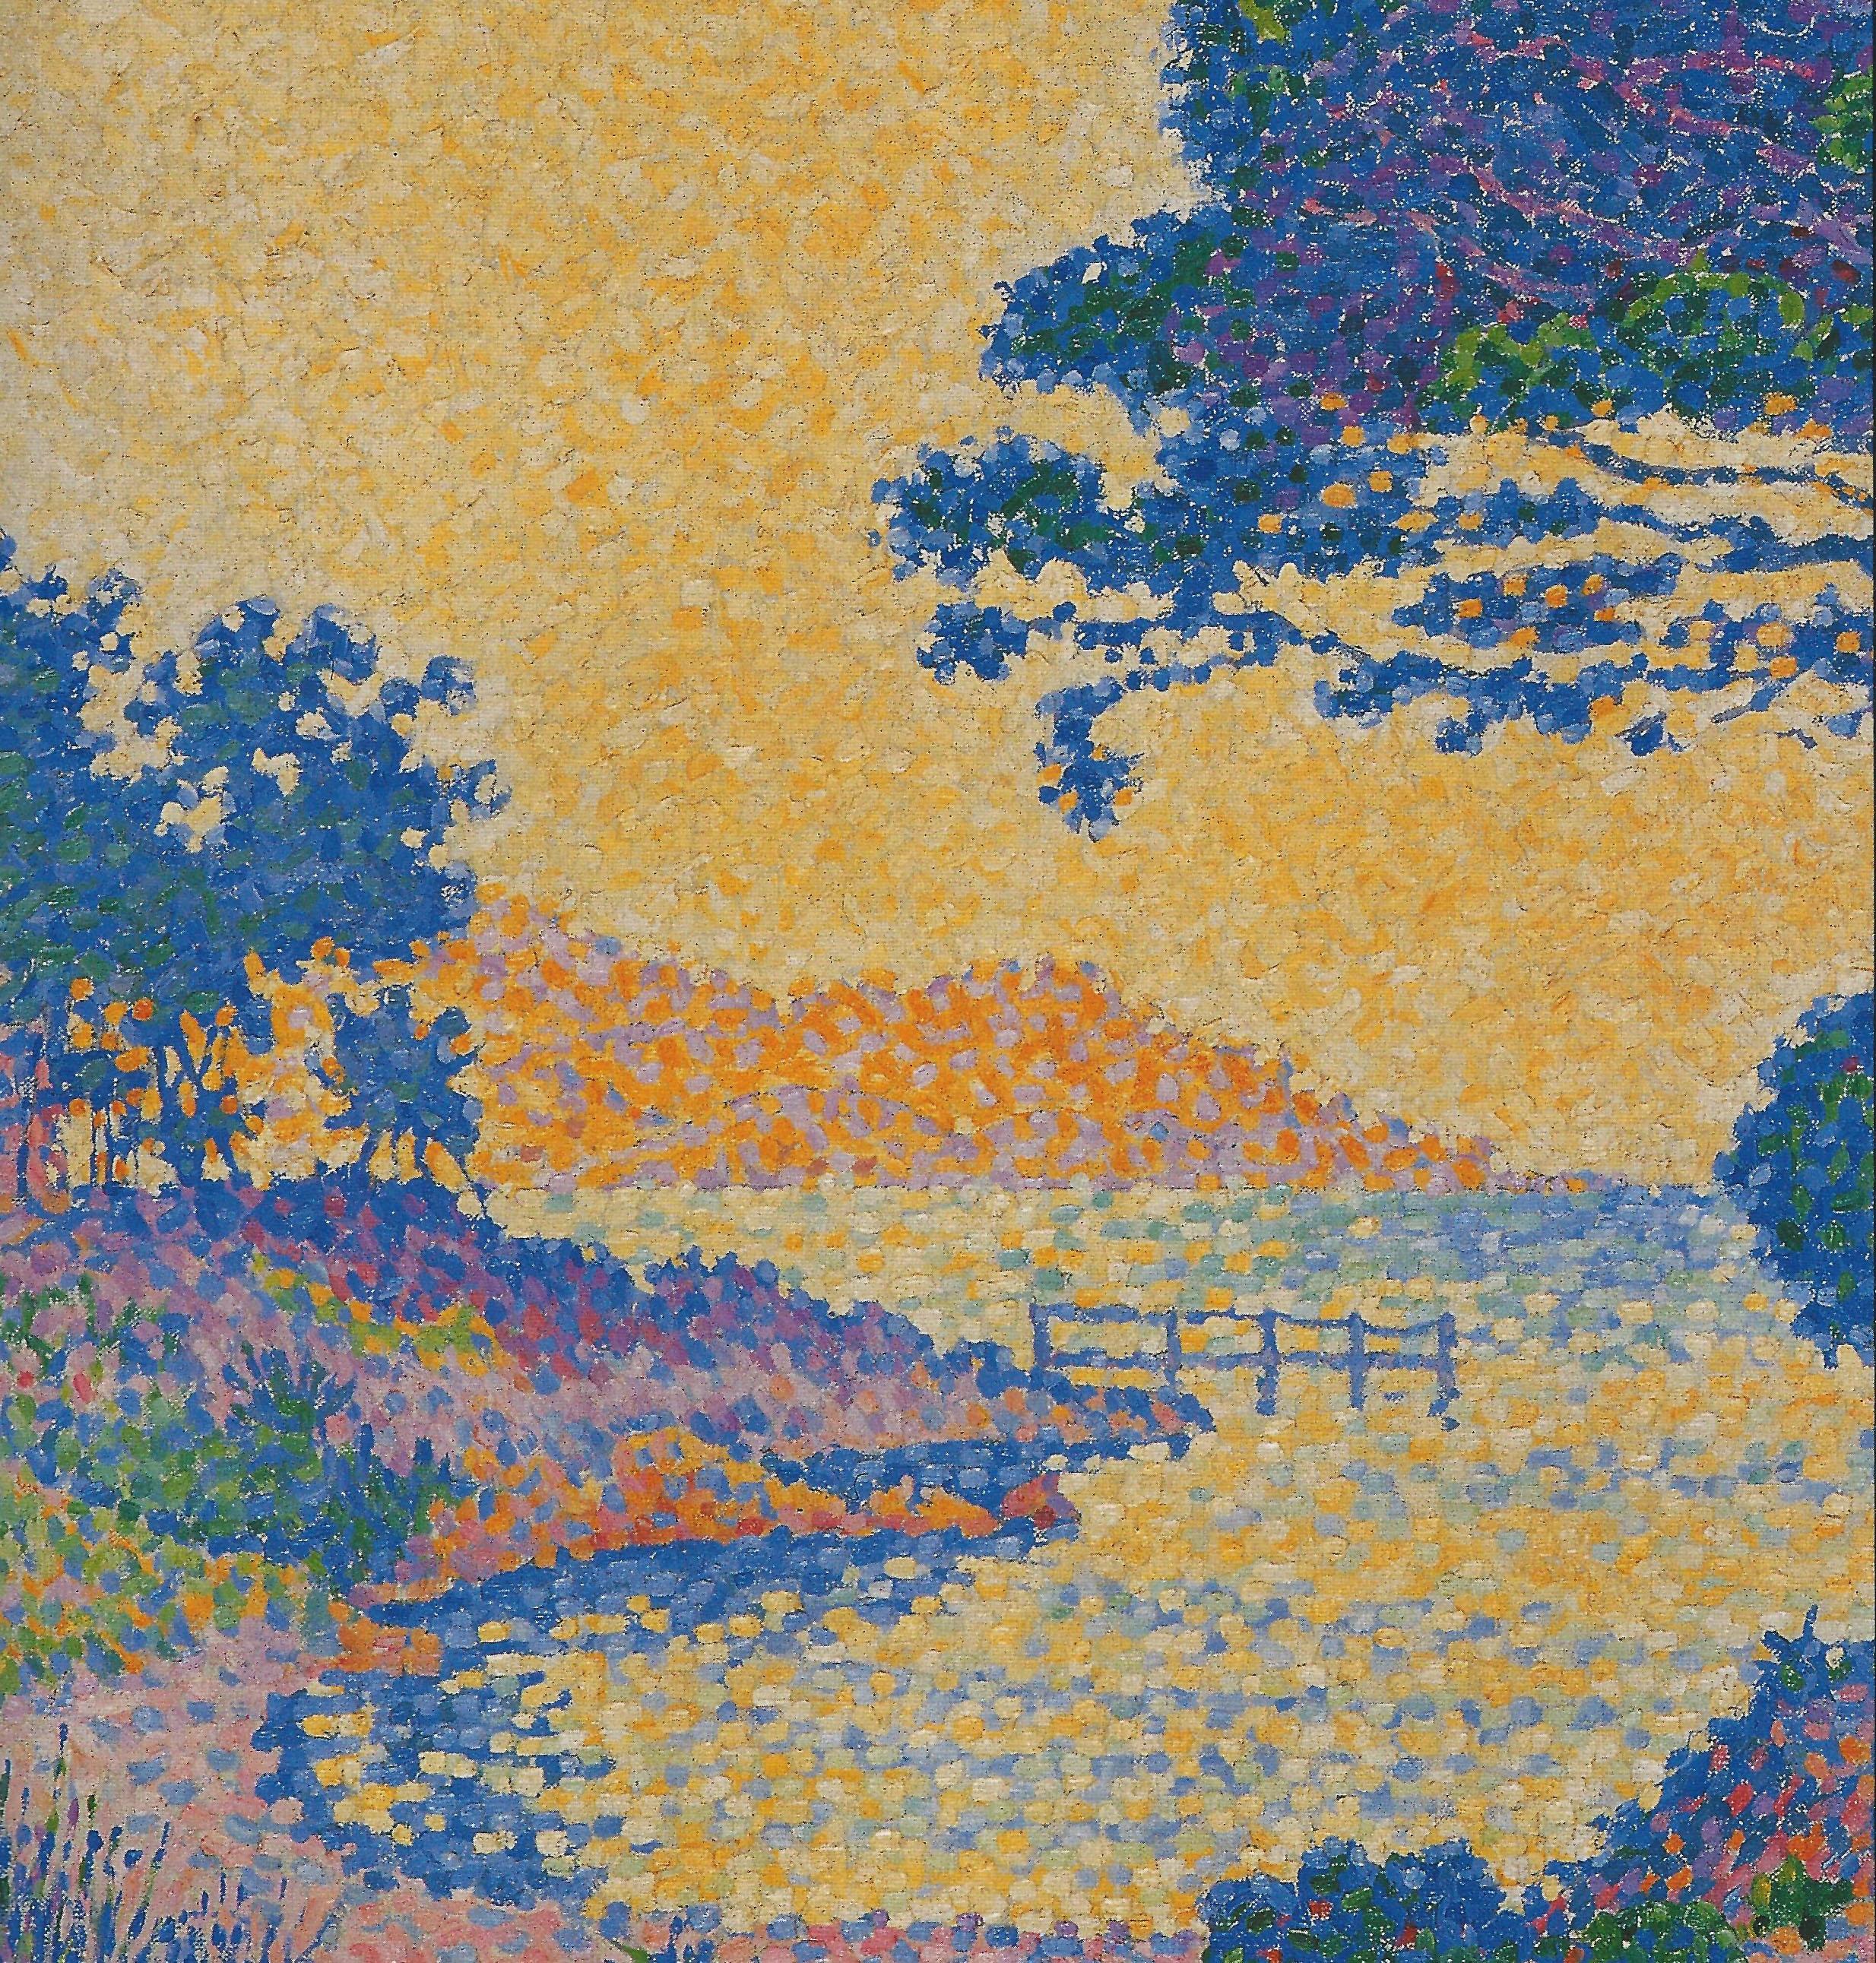 Поль Синьяк - Saint Tropez, The Parasol Pines at les Canoubiers, 1897 фрагмент